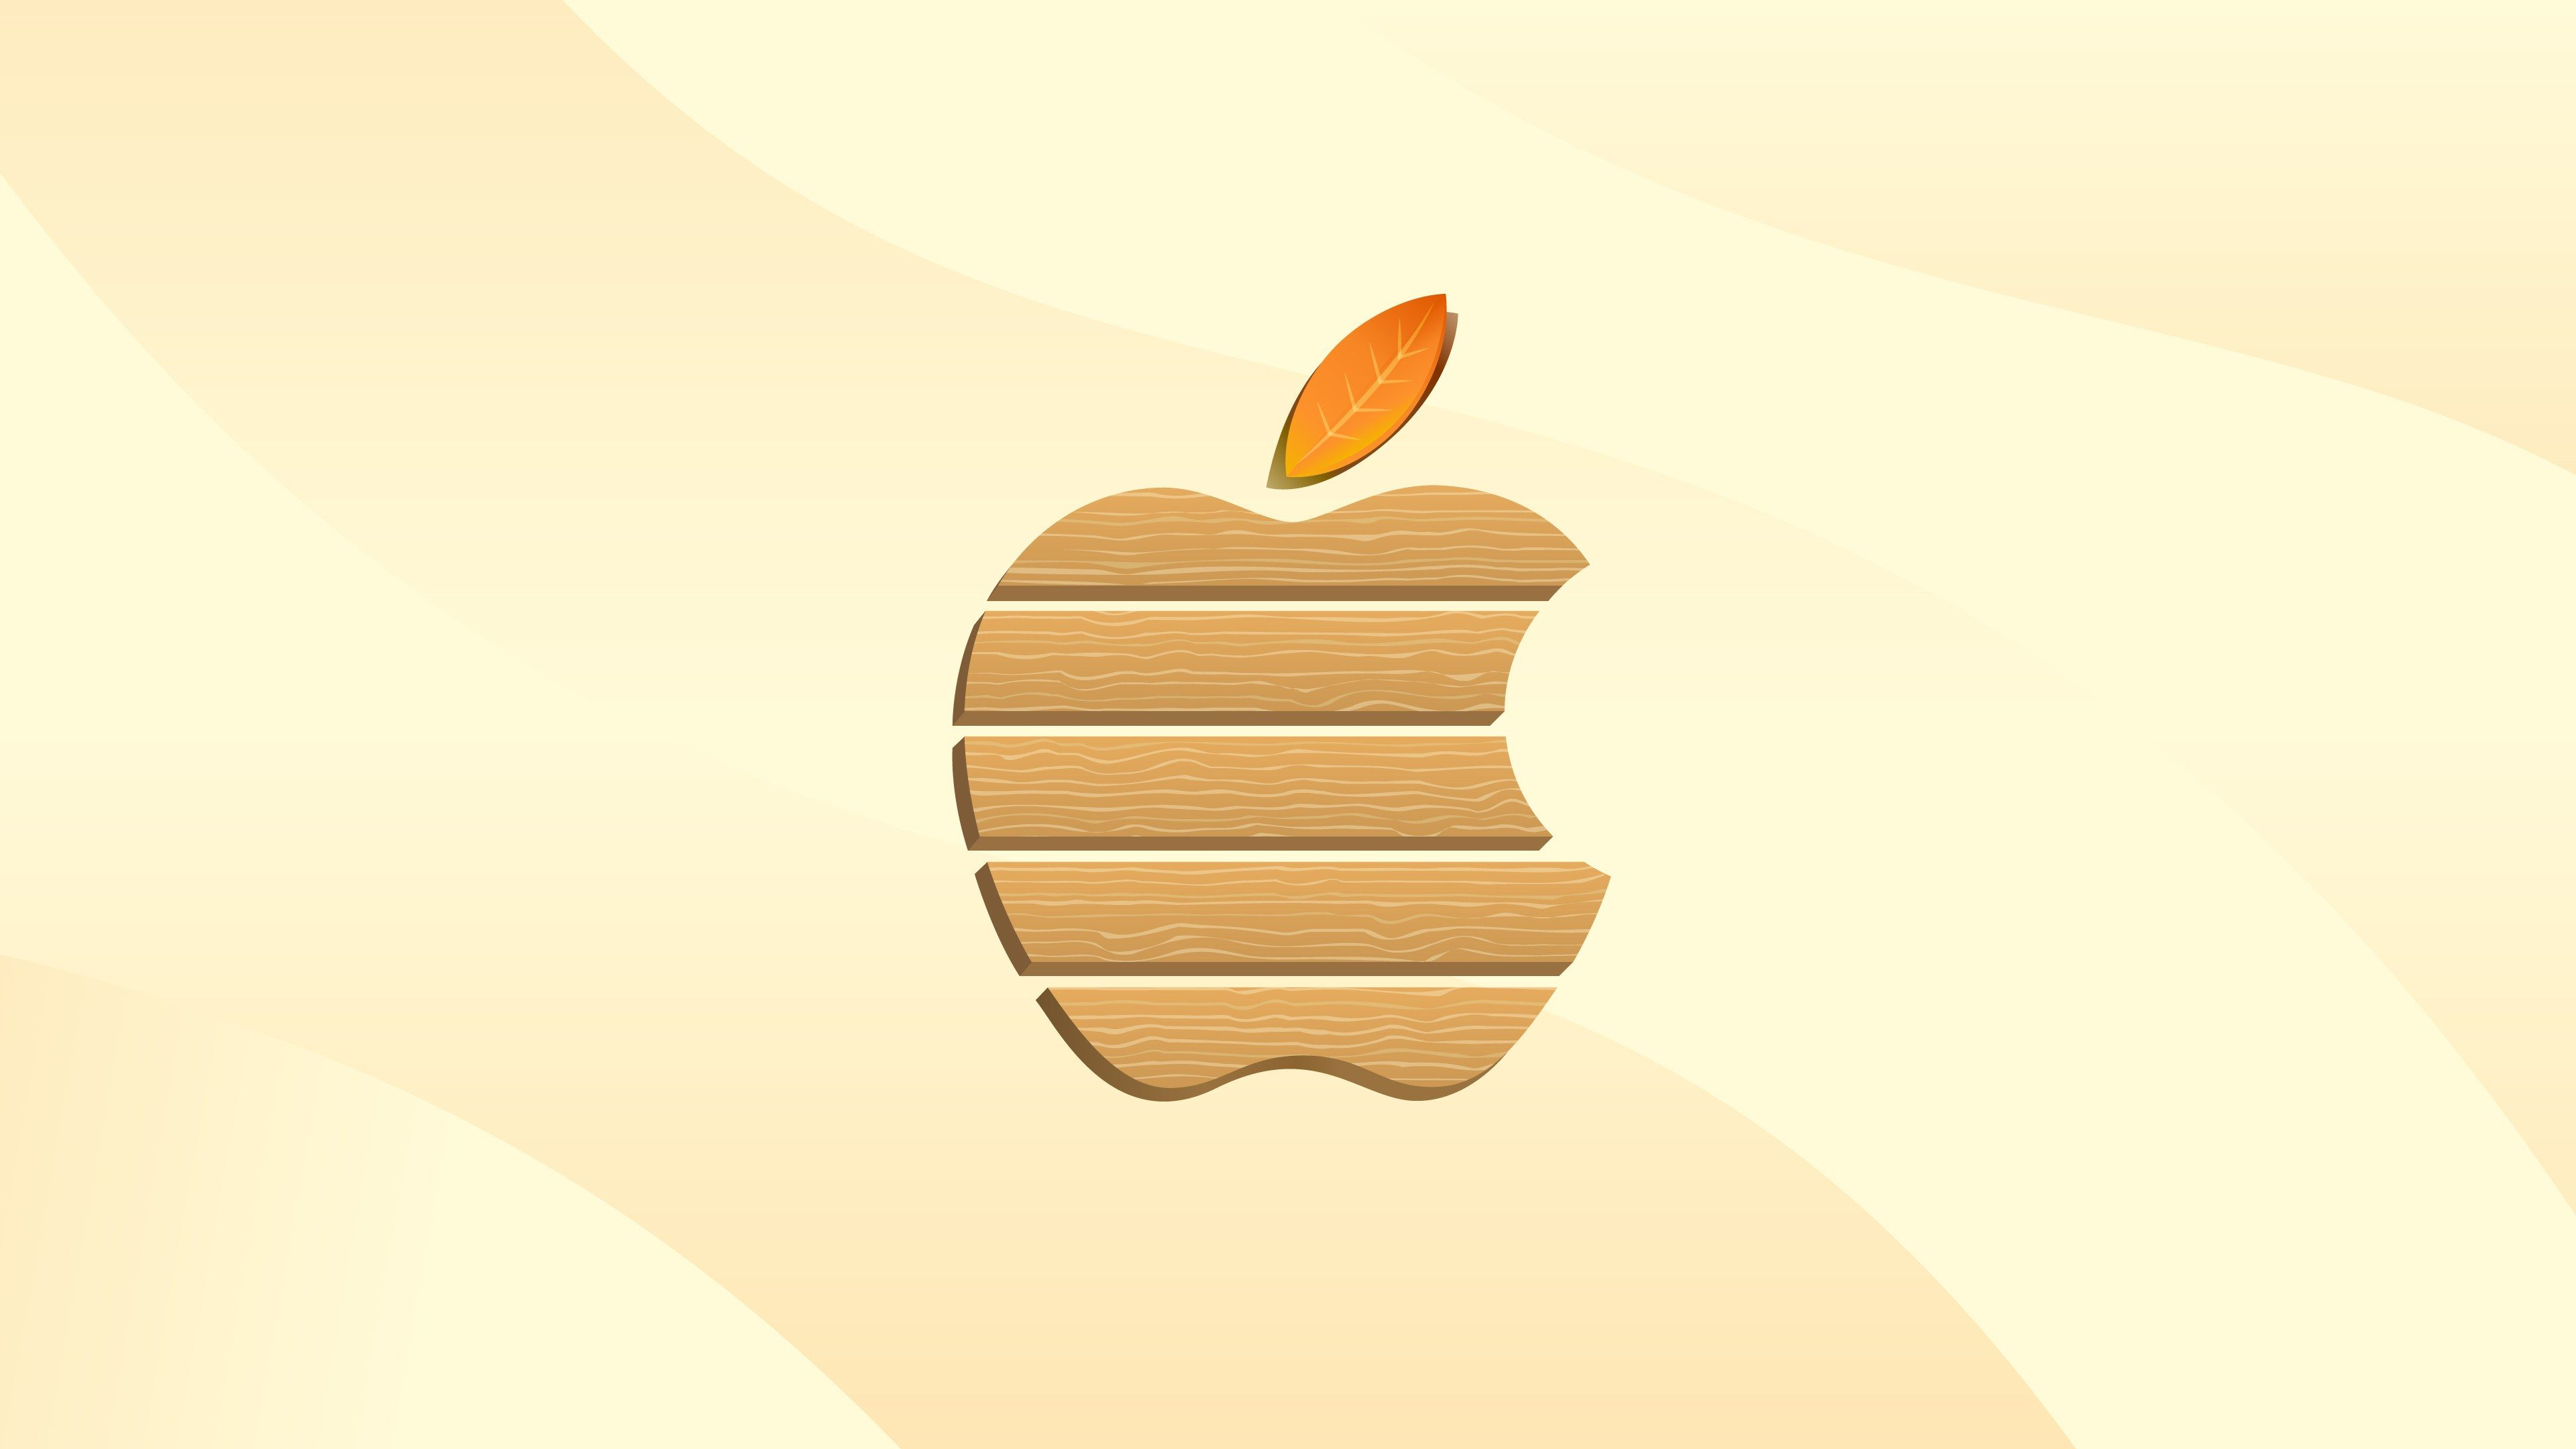 New Old Orchard Apple Store Arriving September 28 in Skokie